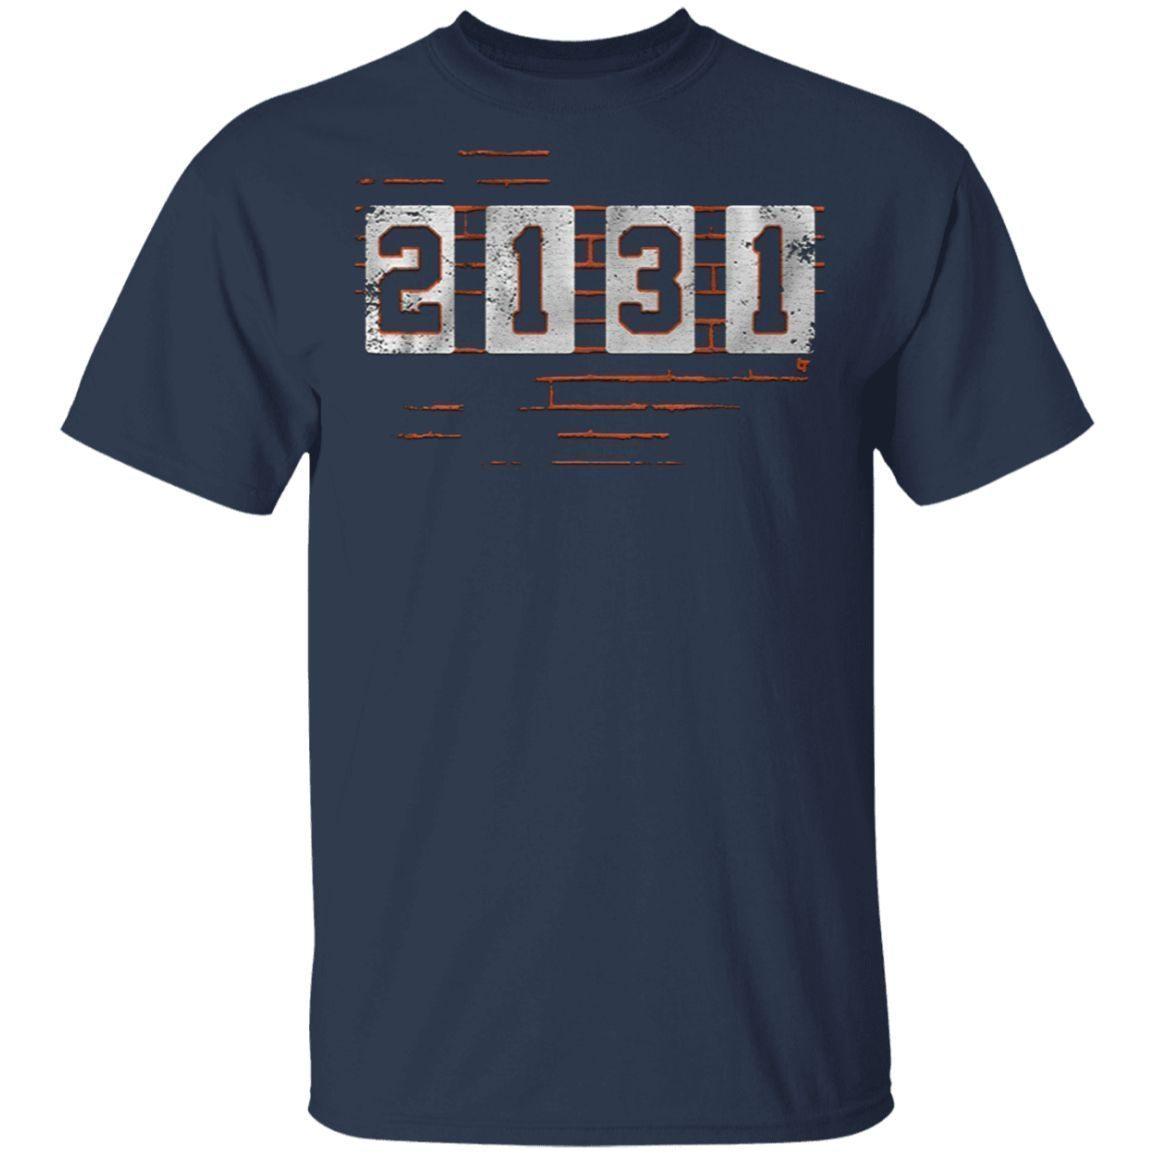 2131 warehouse T-Shirt